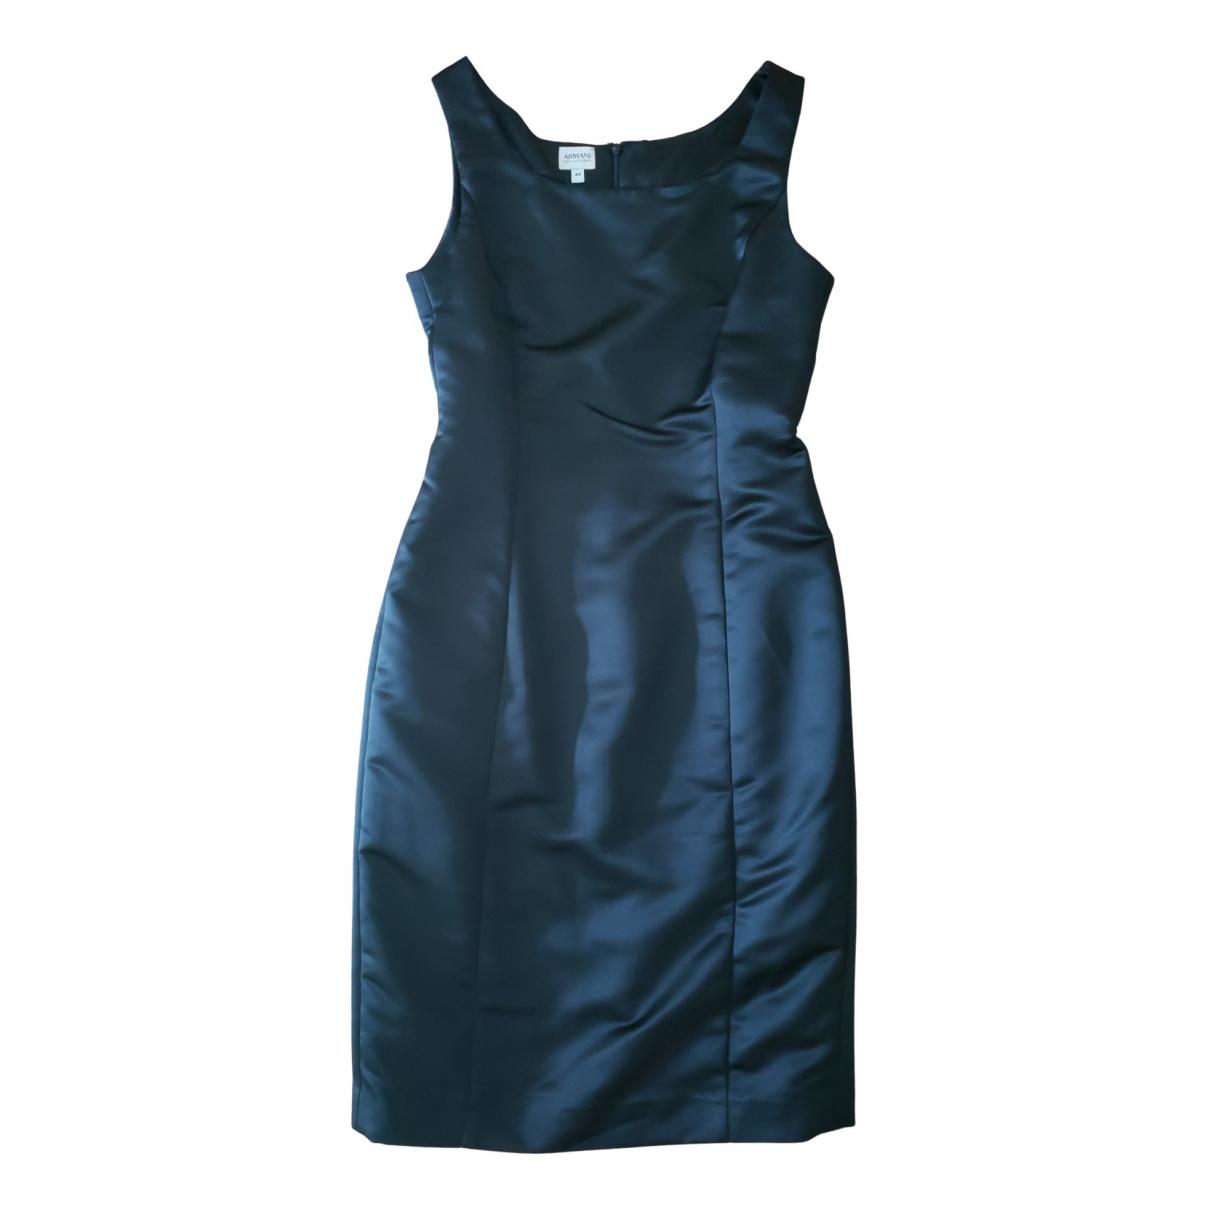 Armani Collezioni \N Kleid in  Schwarz Polyester